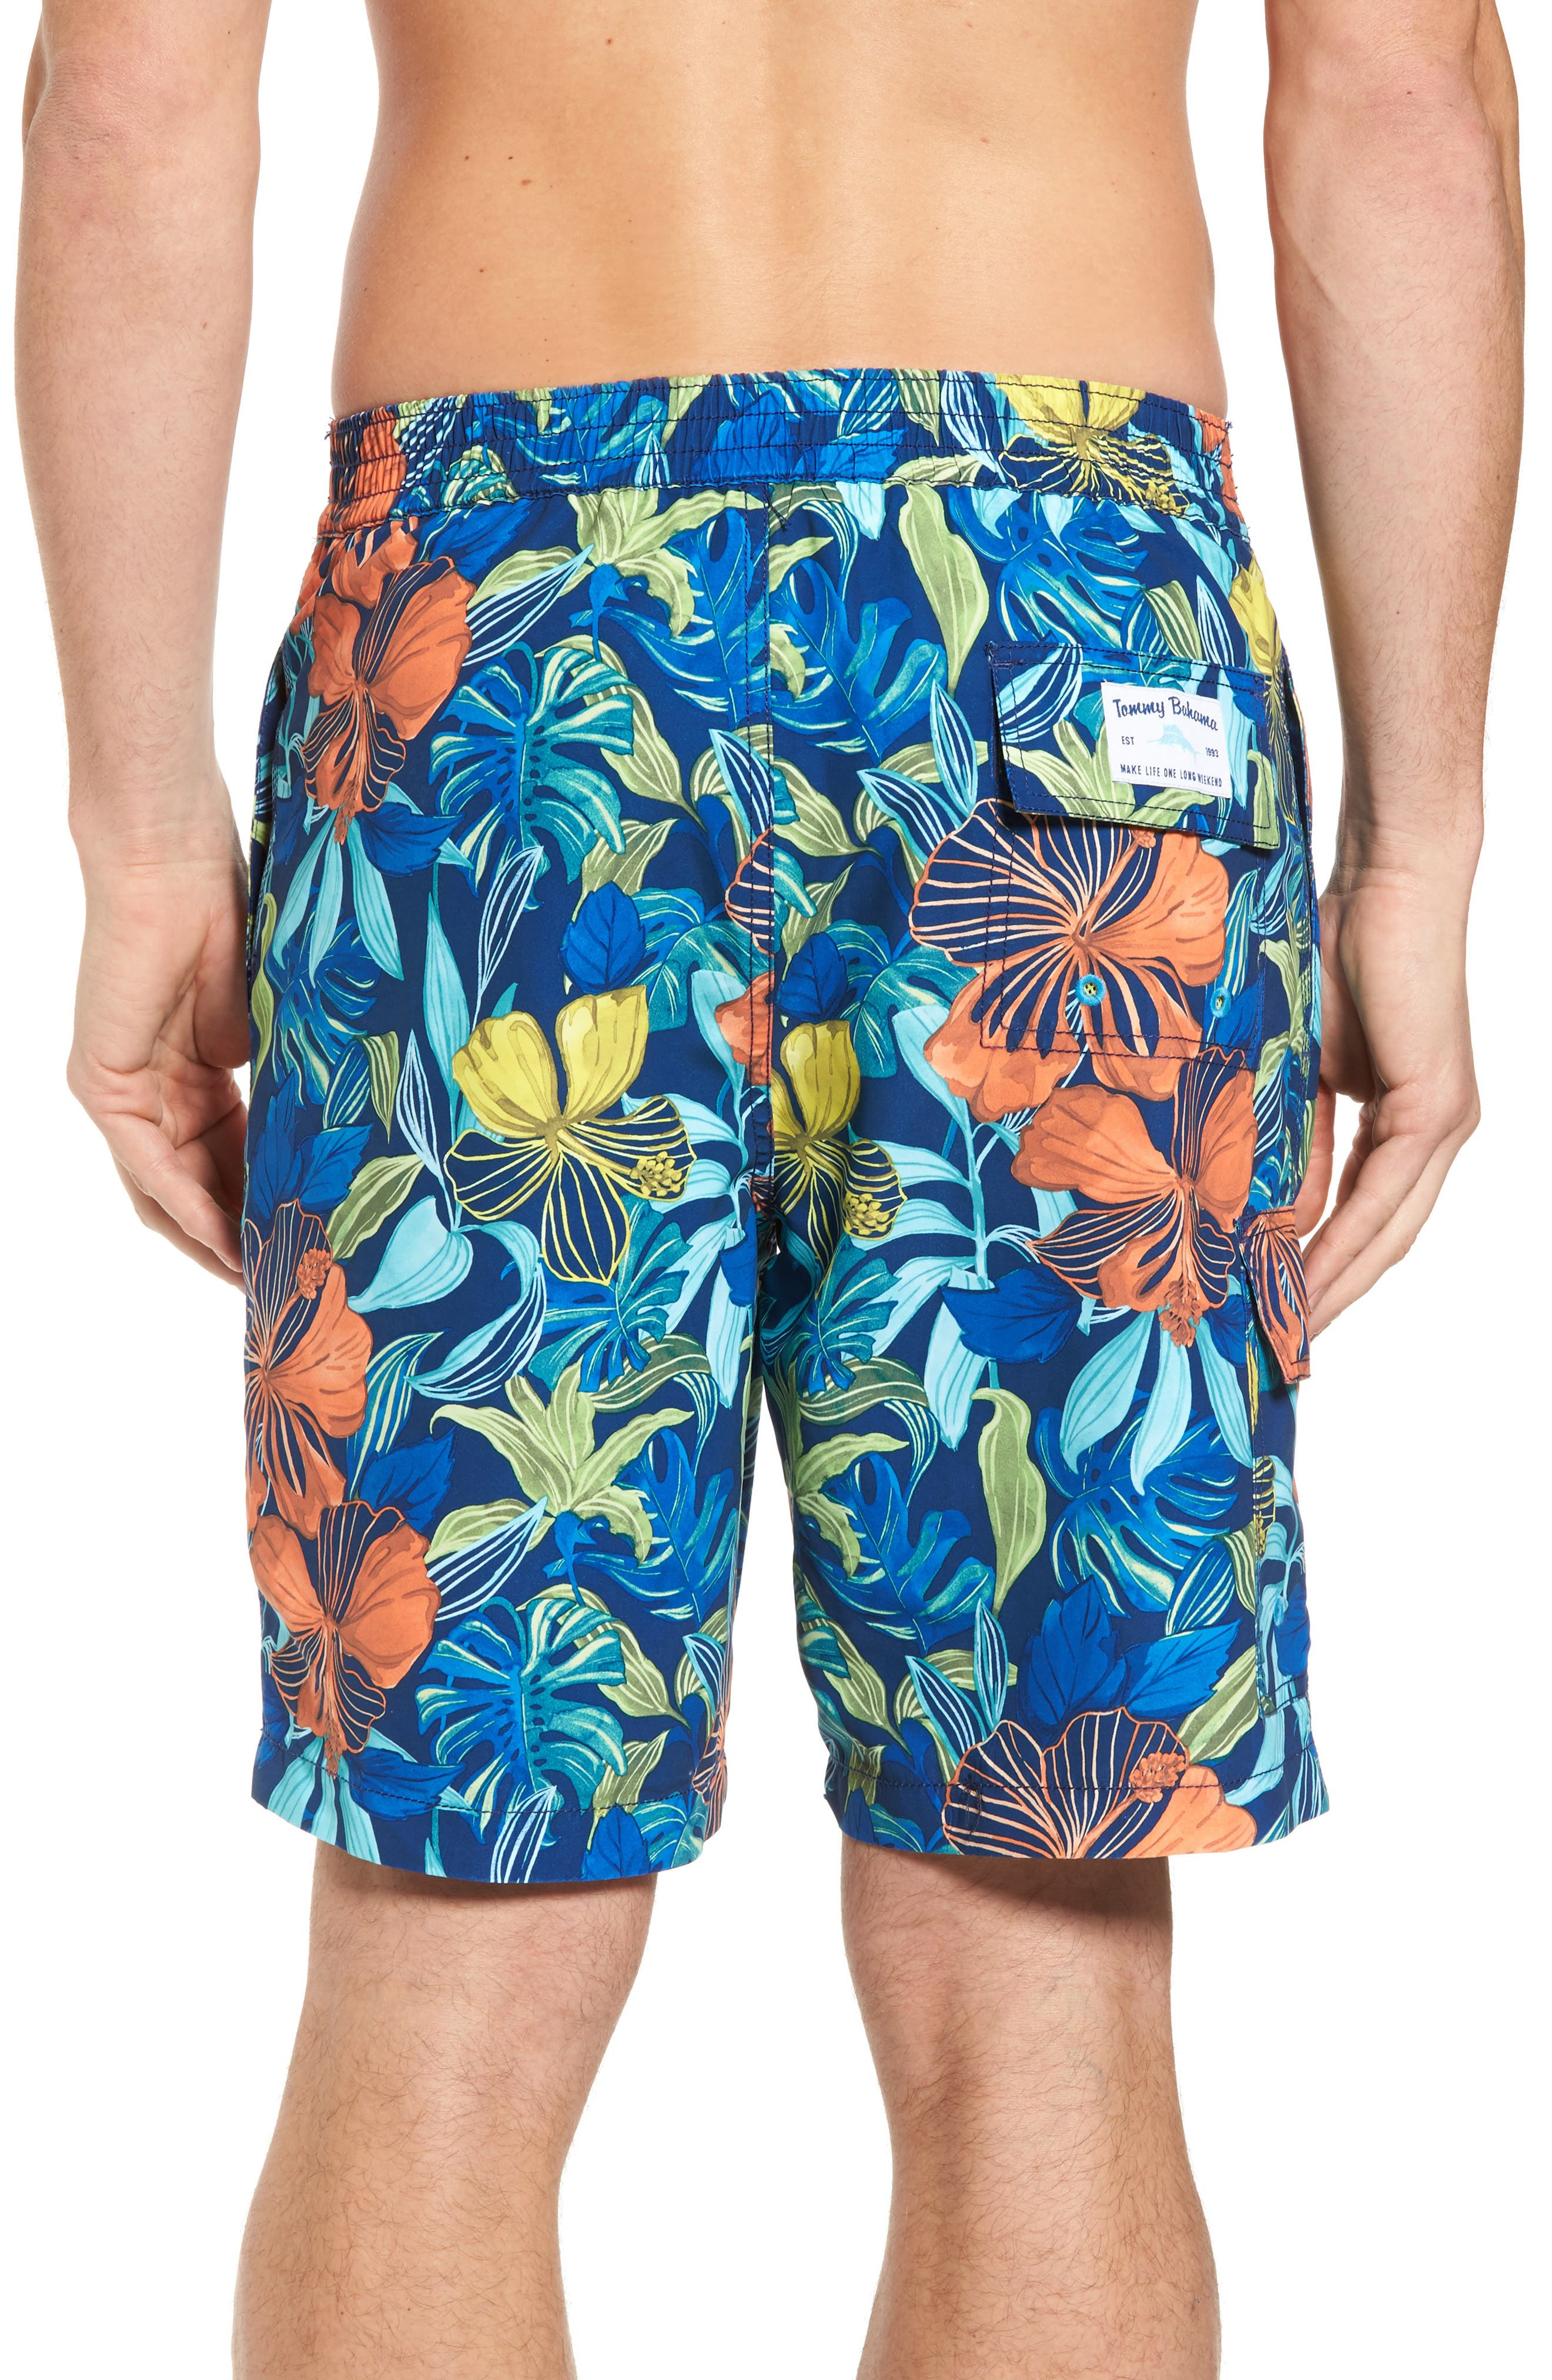 Baja Hibiscus Beach Swim Trunks,                             Alternate thumbnail 2, color,                             Kingdom Blue